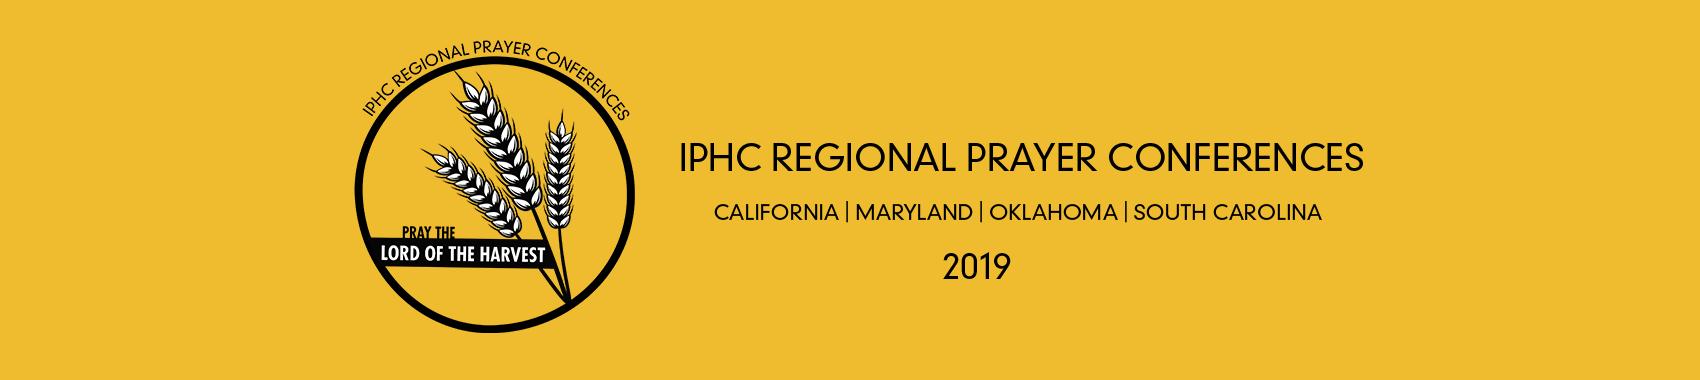 Regional Prayer Conferences